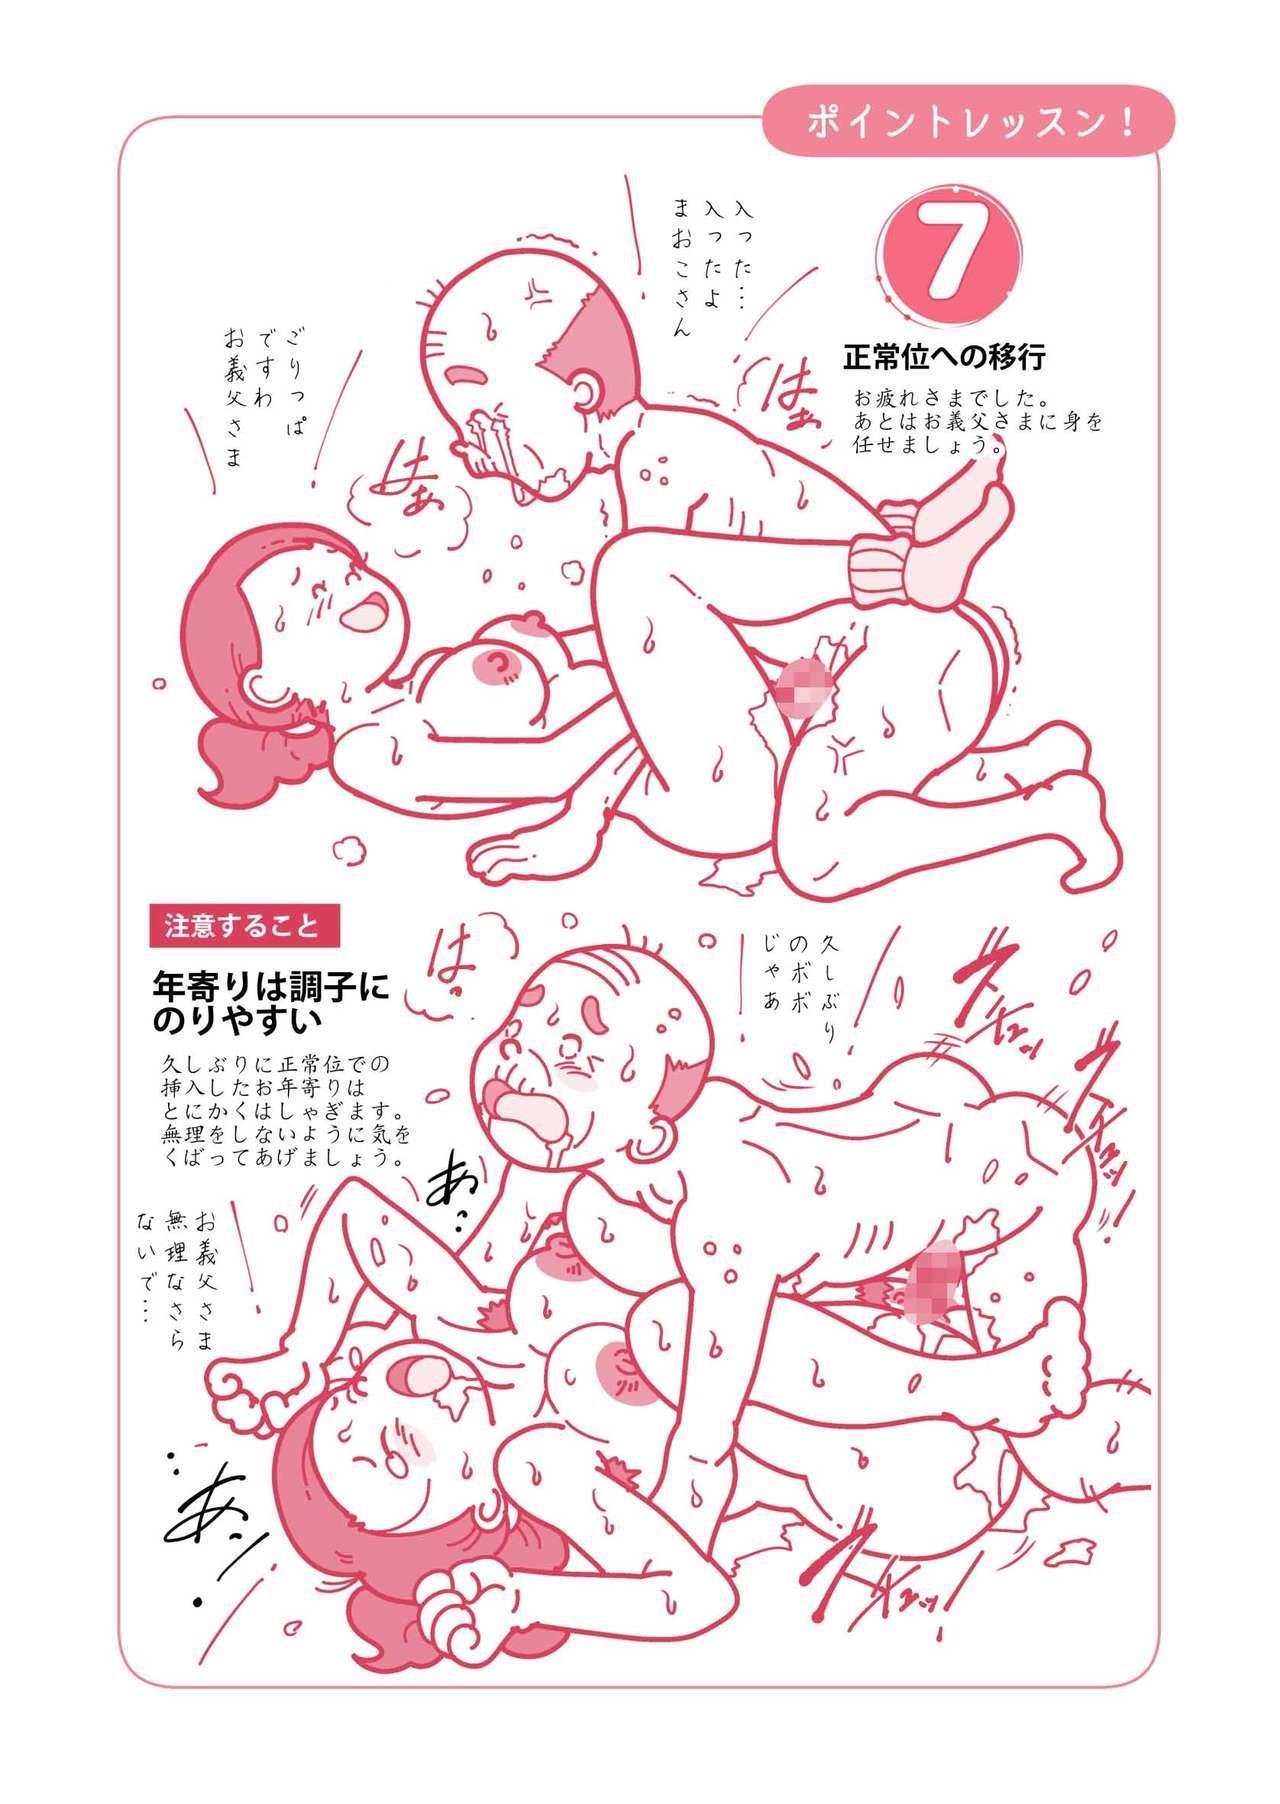 Isogasii Okaasan No Tamuno Sasa Rouzin Seikaigo | Guide for Elderly Sex Health Care to Busy Mom 59